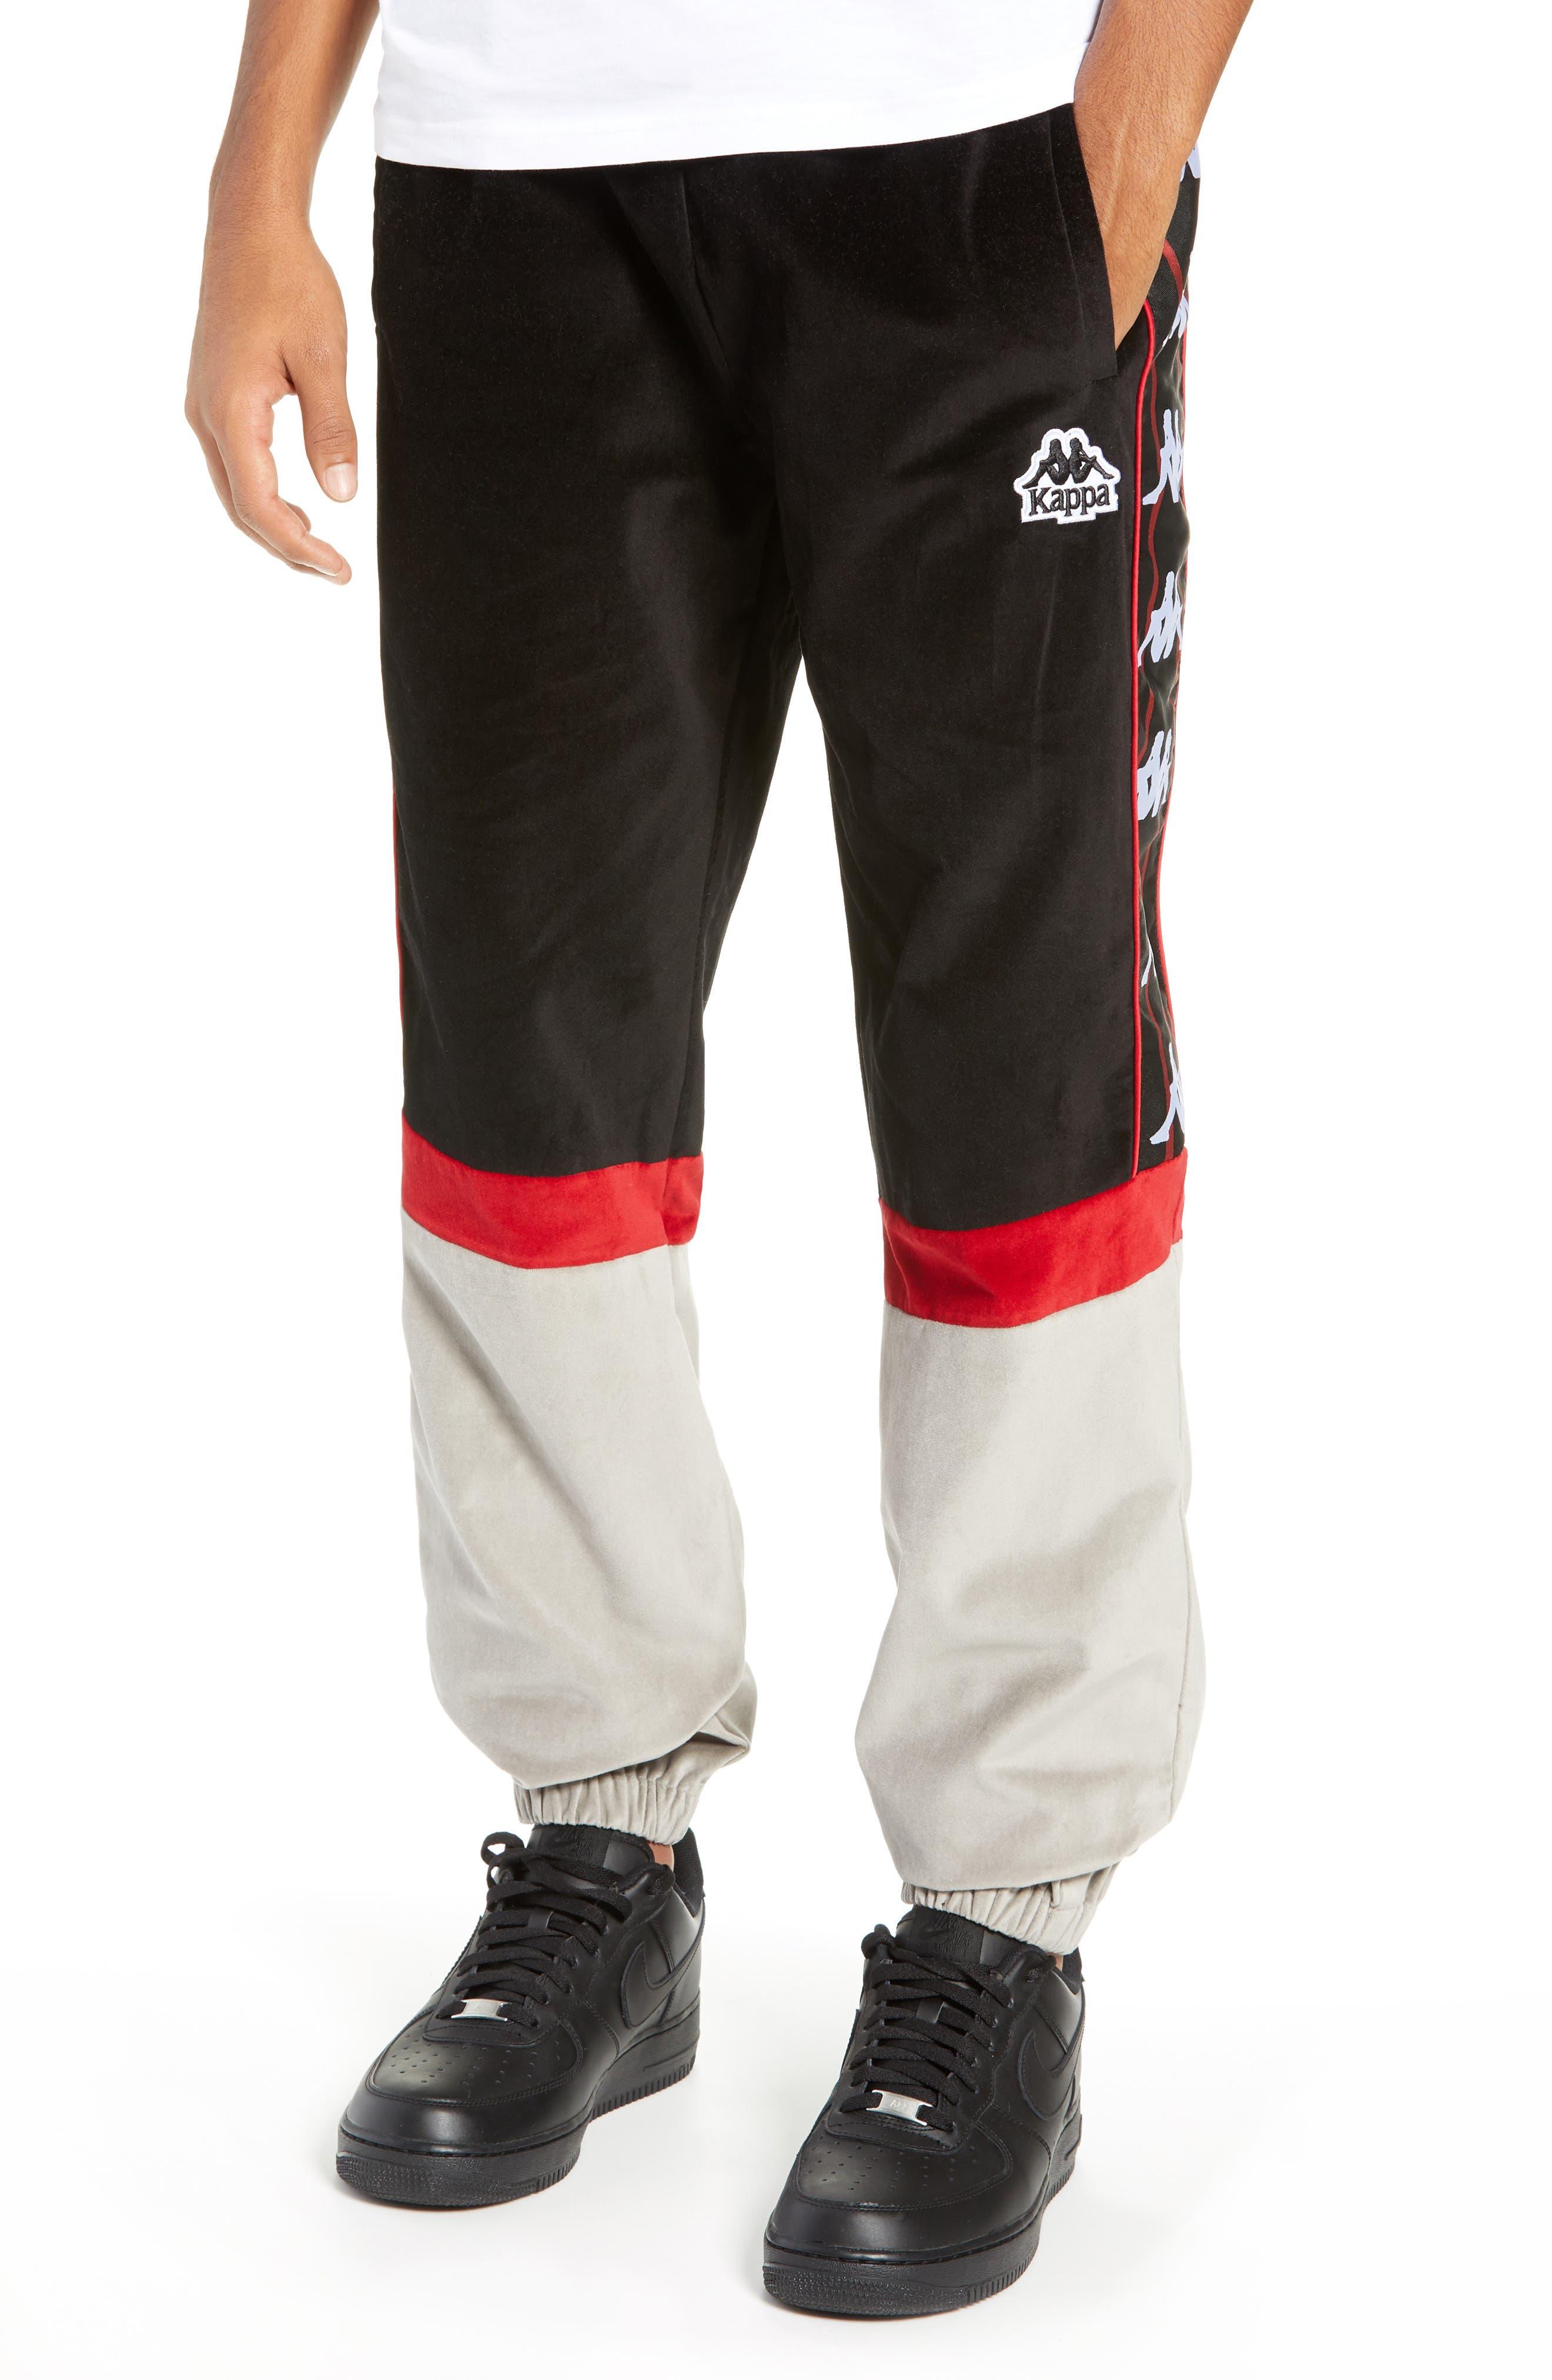 Authentic Serena Cotton Velour Track Pants,                         Main,                         color, BLACK/ RED/ GREY